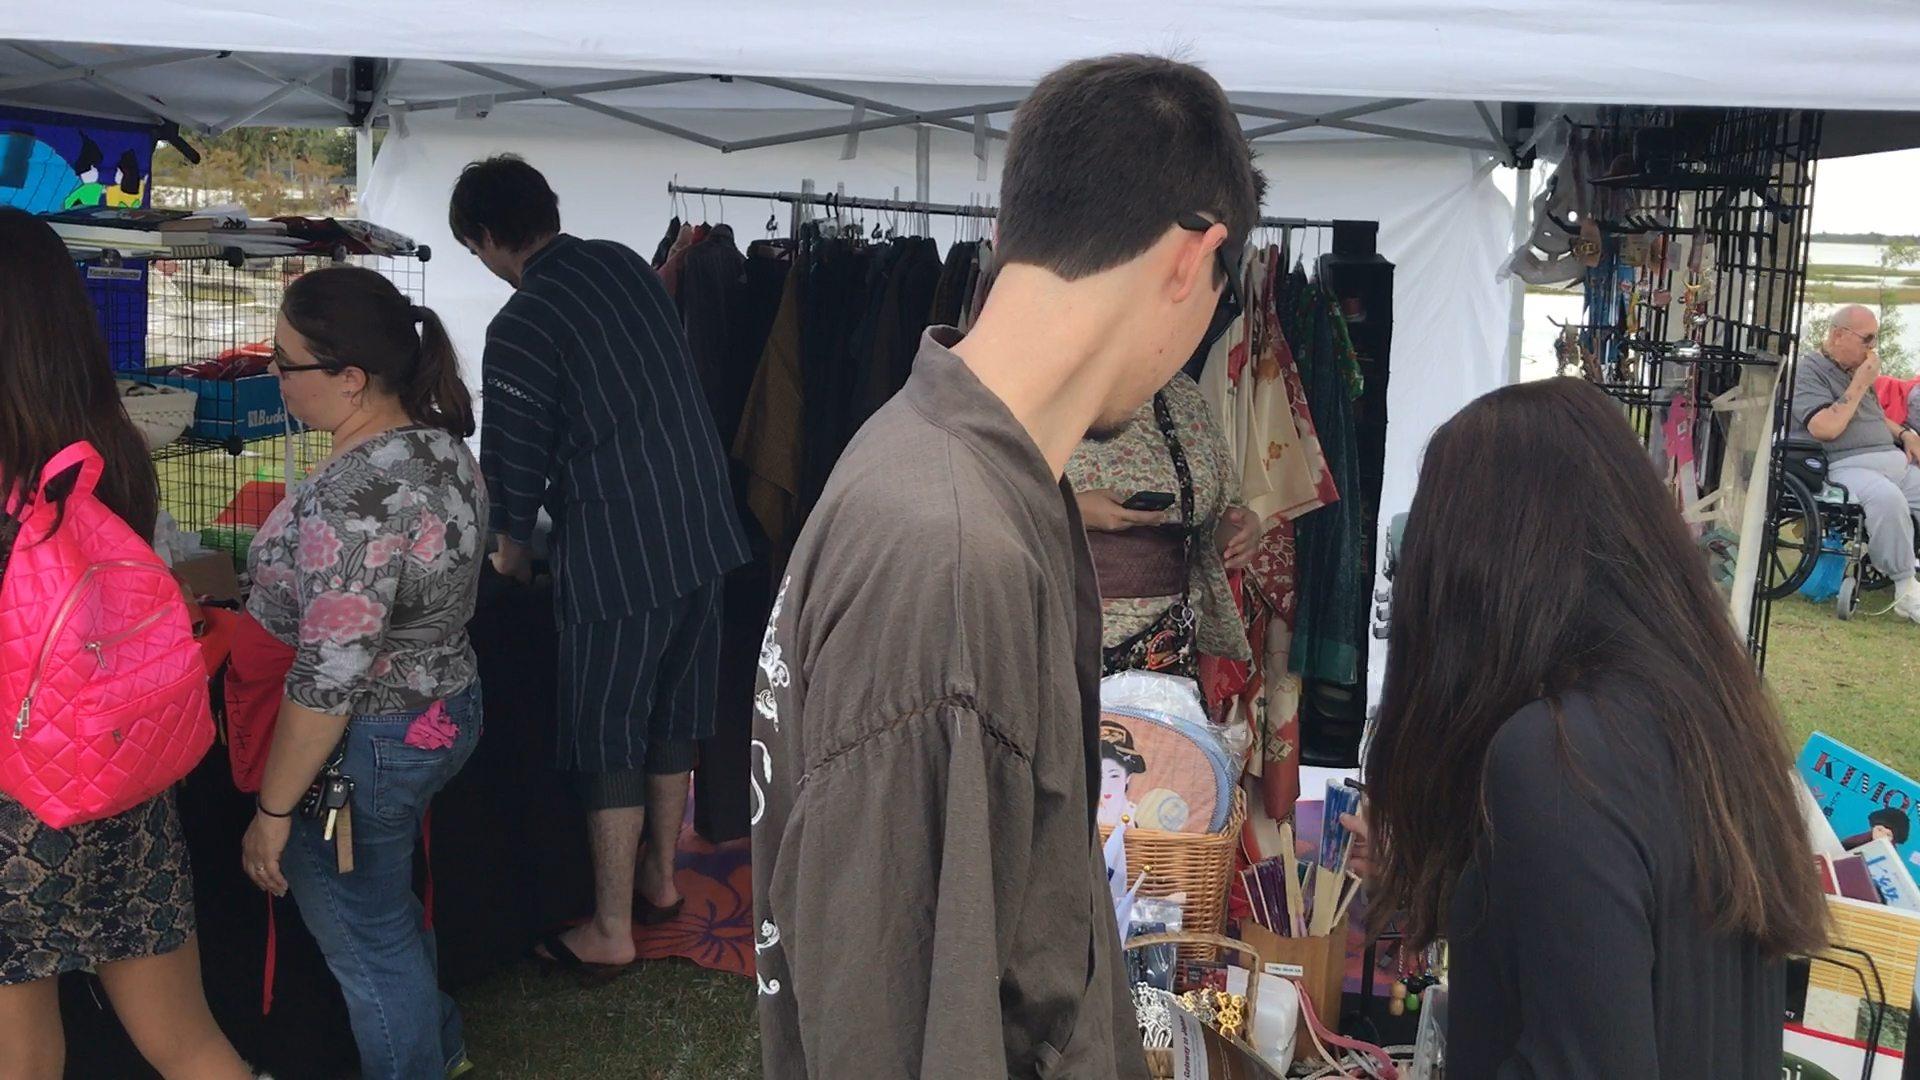 Sakiko No Kimonoya - JAO Orlando Japan Festival Review YouTube Video 2017 Lots of Fun Every Year